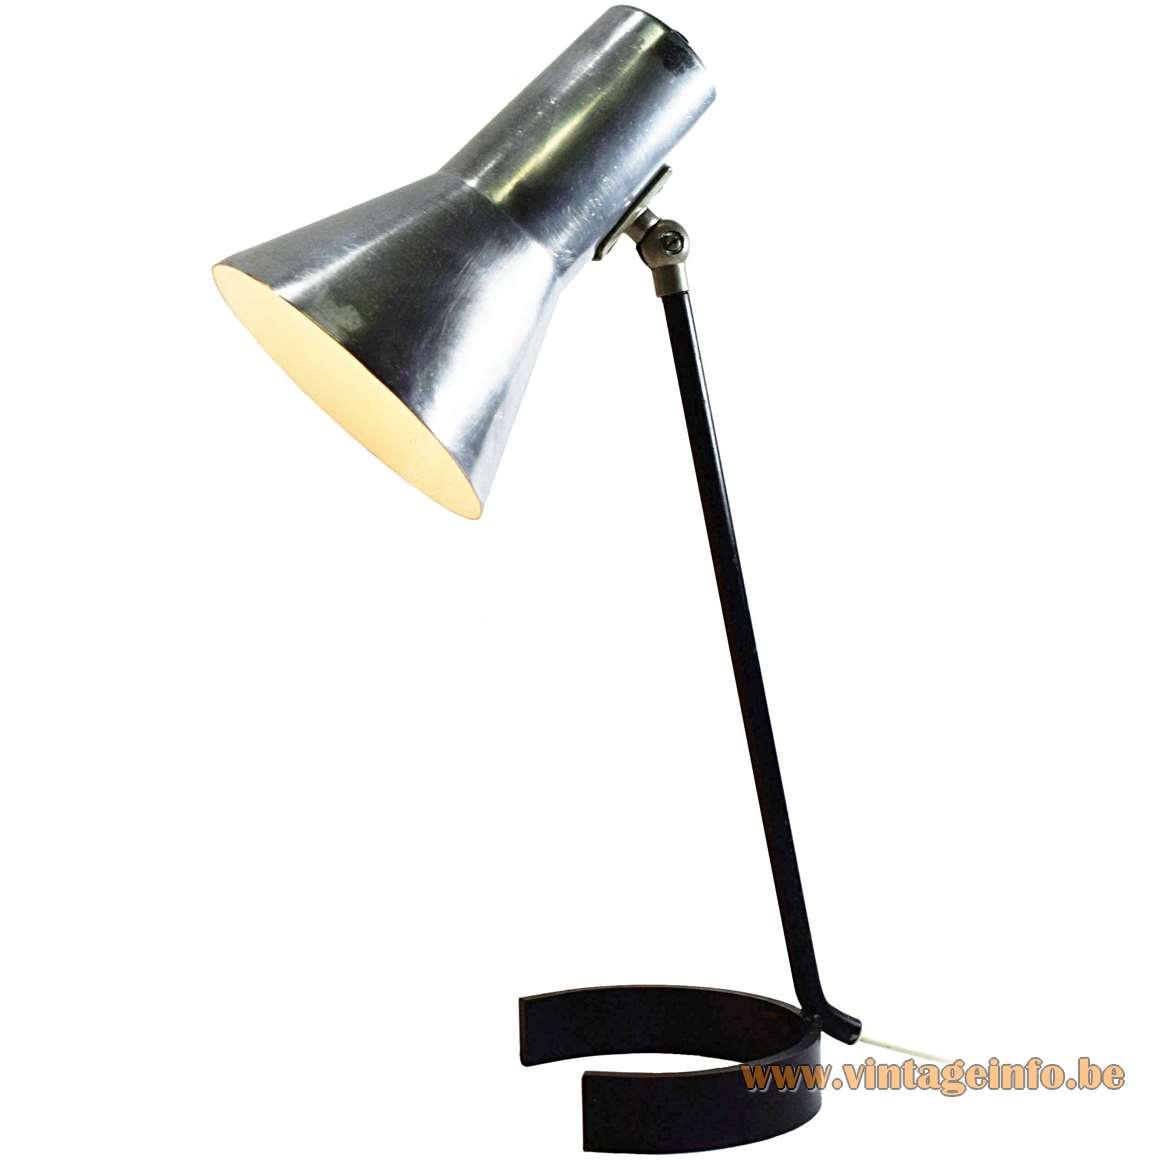 ANVIA Desk Lamp 6043 black iron horseshoe base aluminium lampshade 1950s 1960s MCM